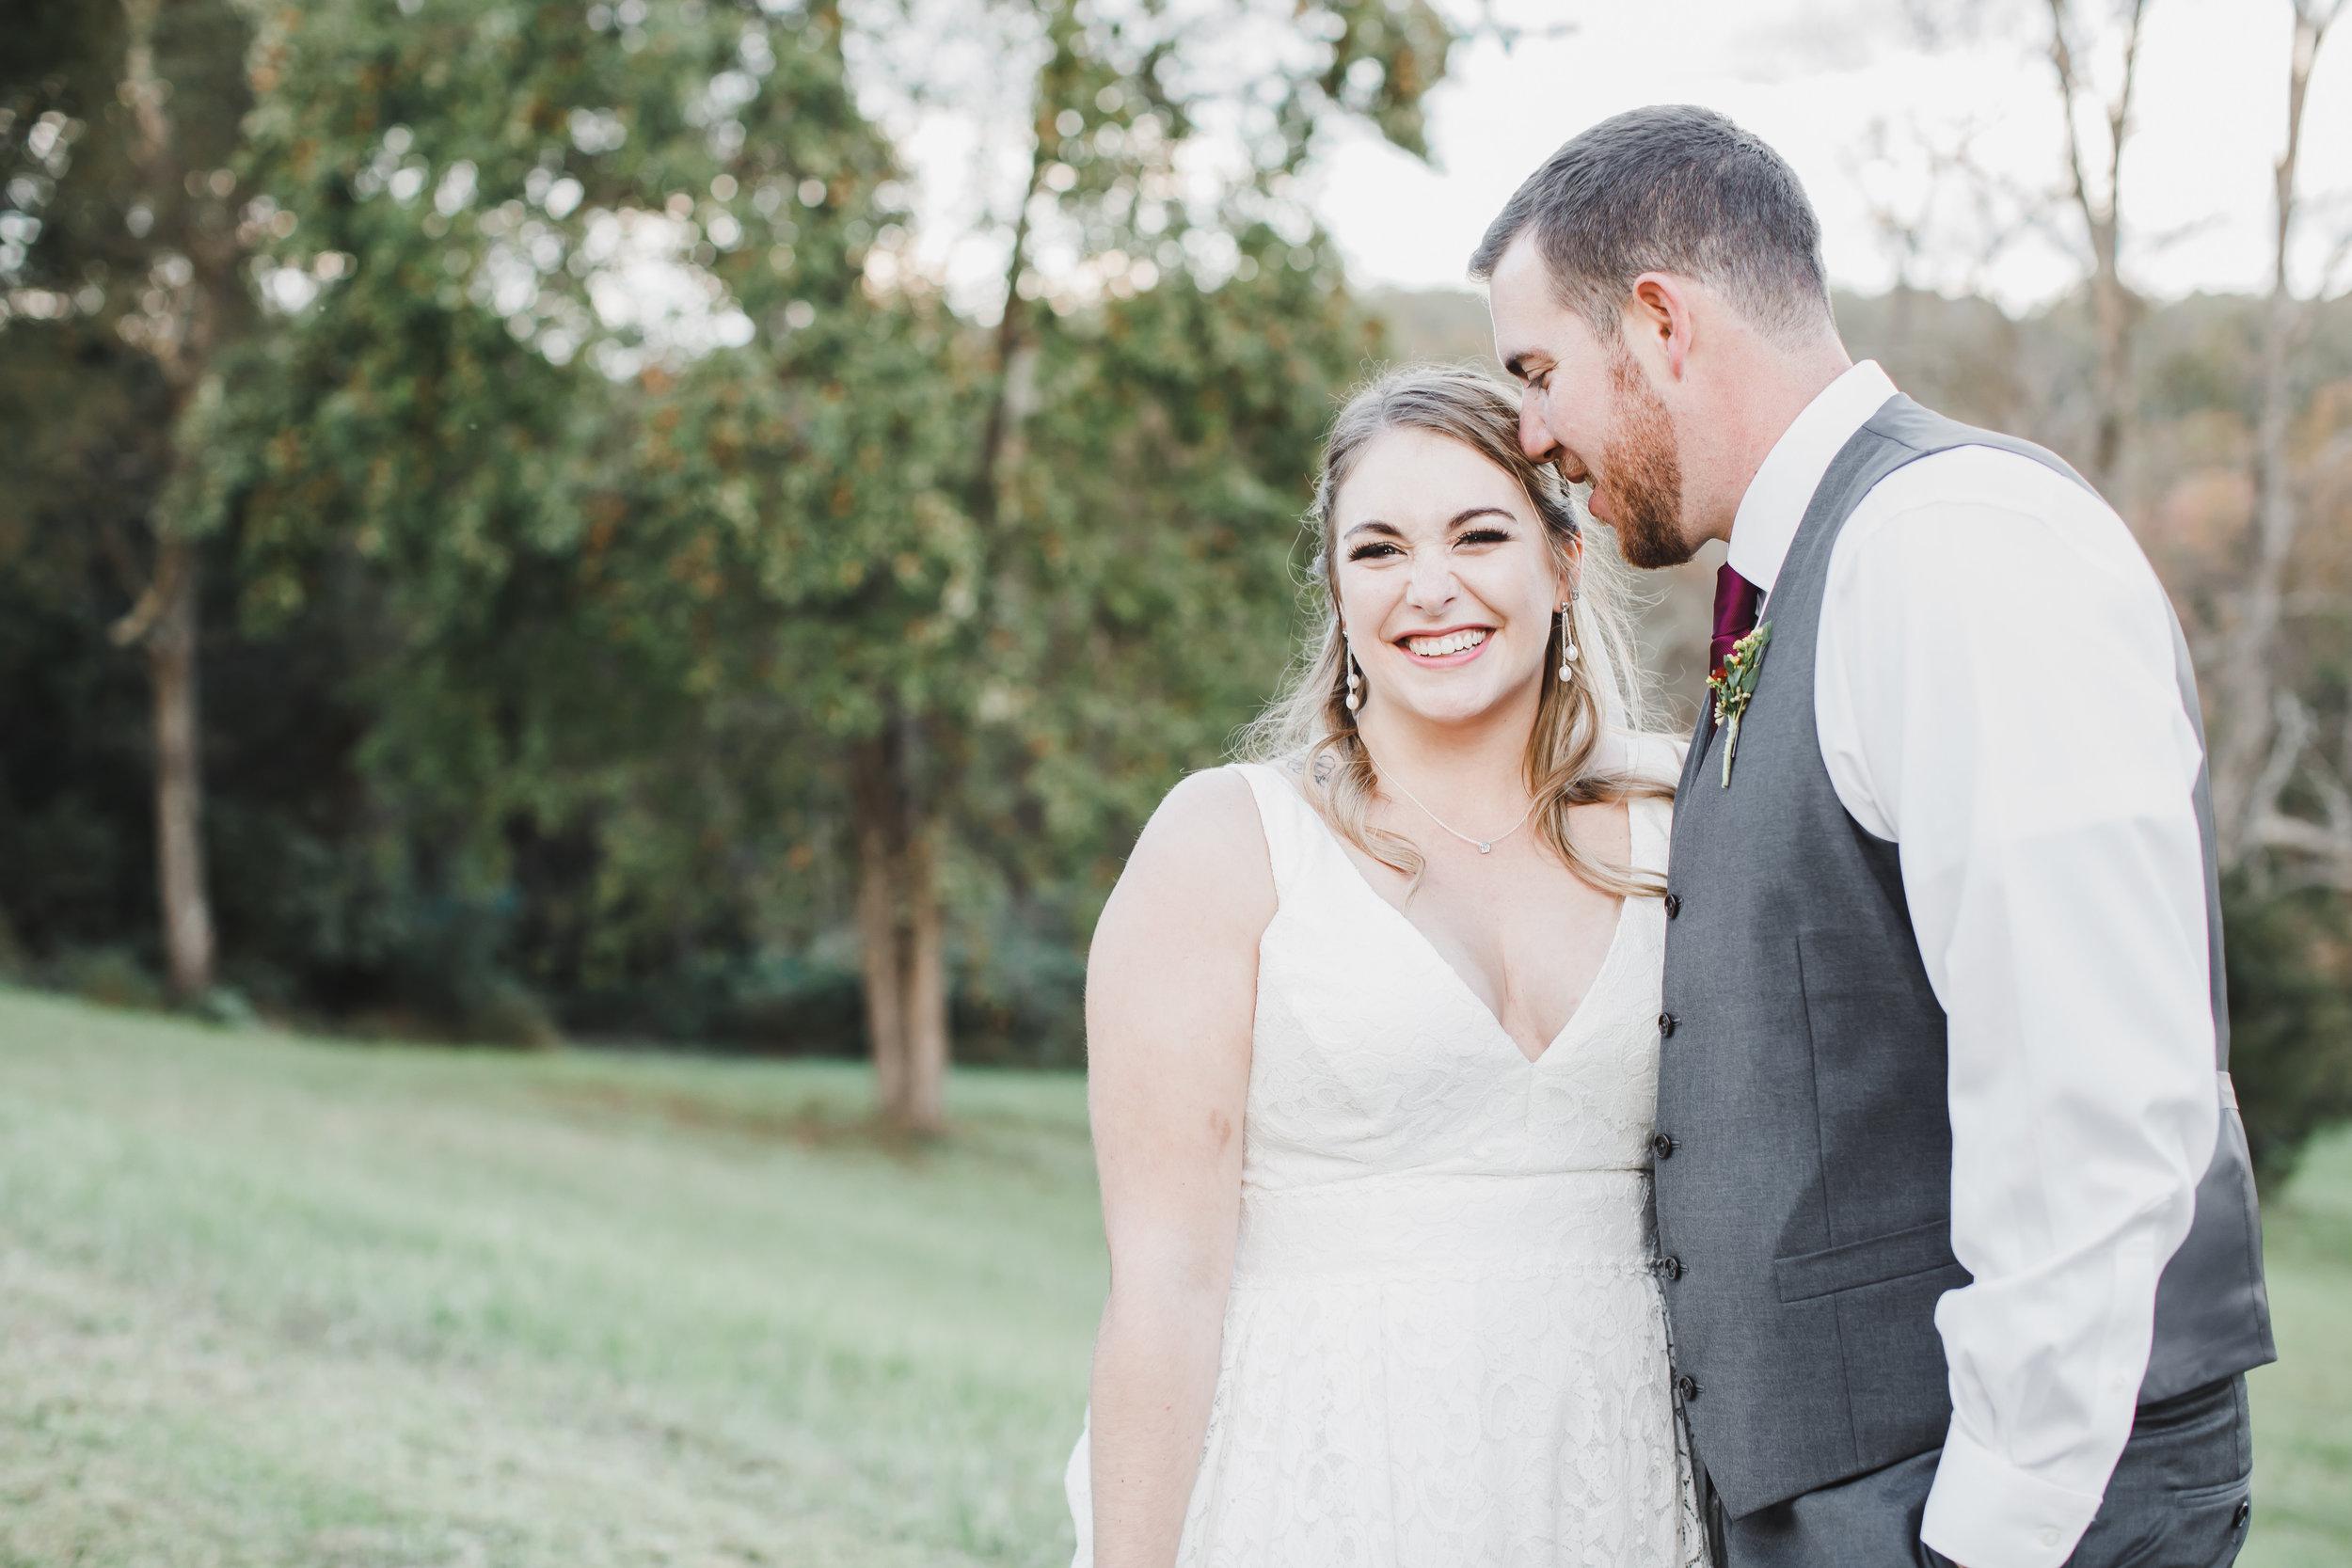 Fling - Virginia Wedding Photographer - Photography by Amy Nicole-4613-2.jpg